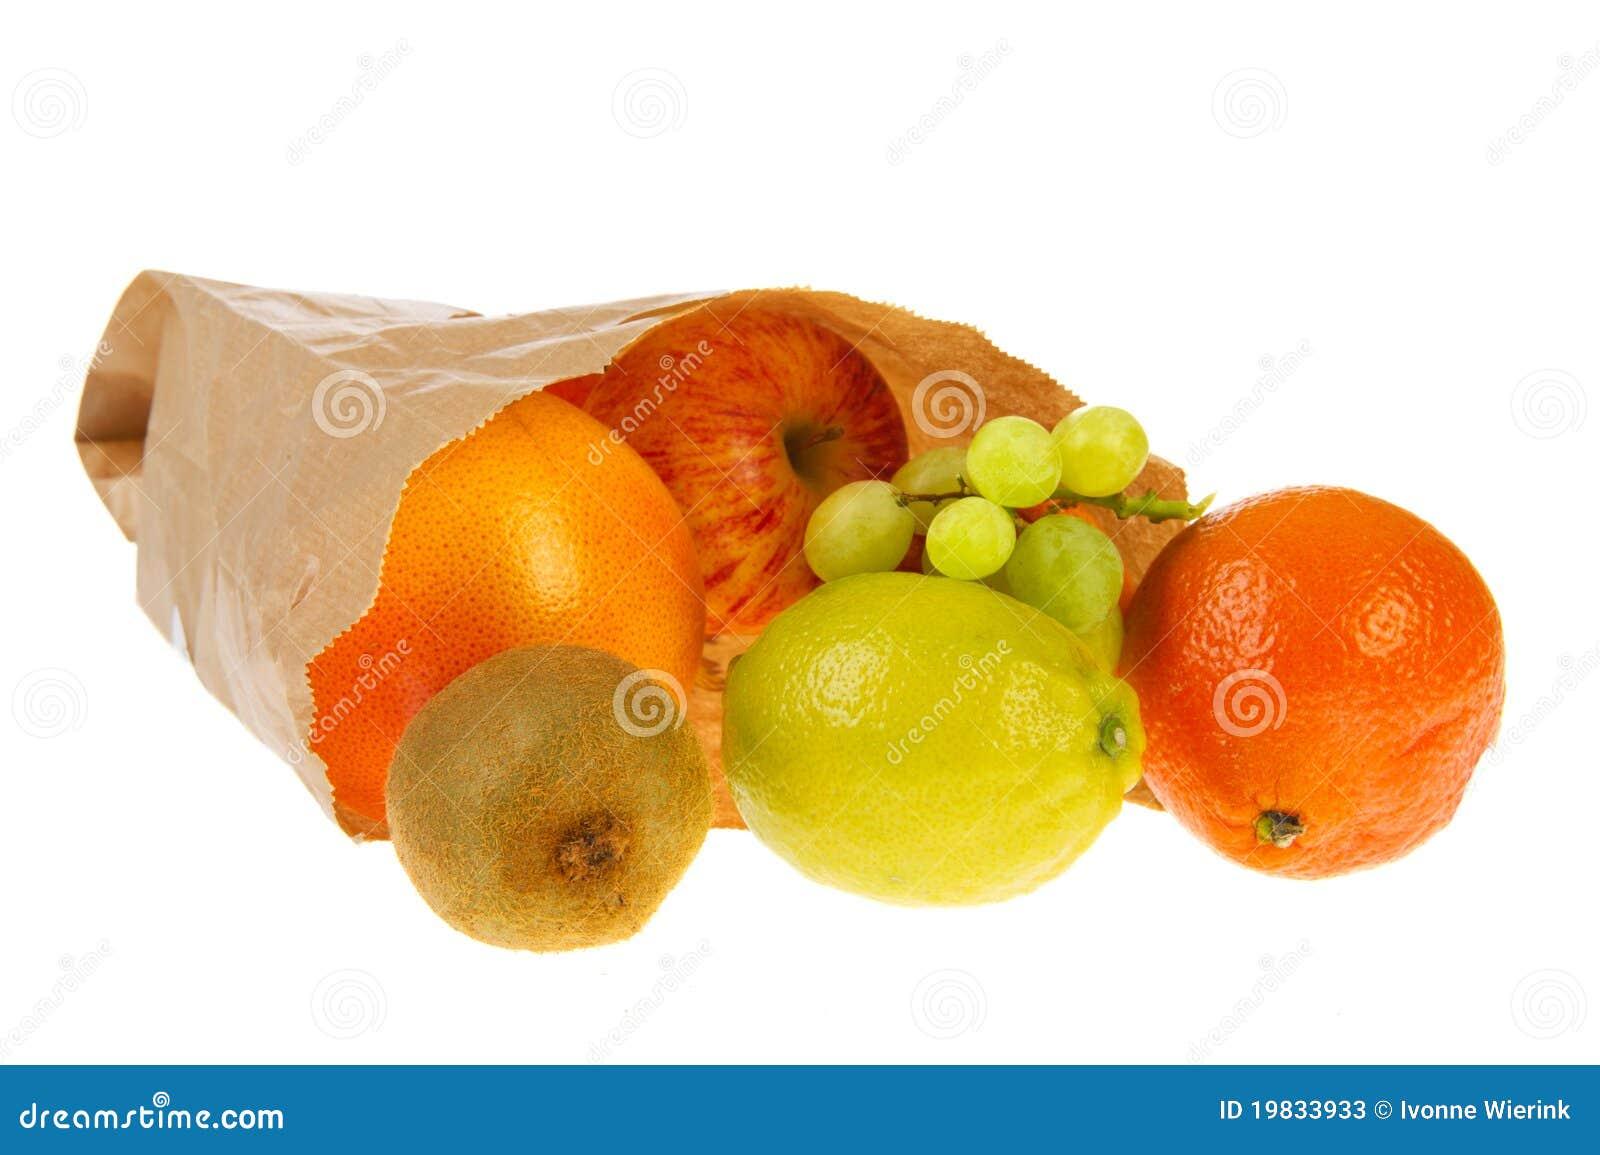 Paper Bag With Various Fruit Stock Photos Image 19833933